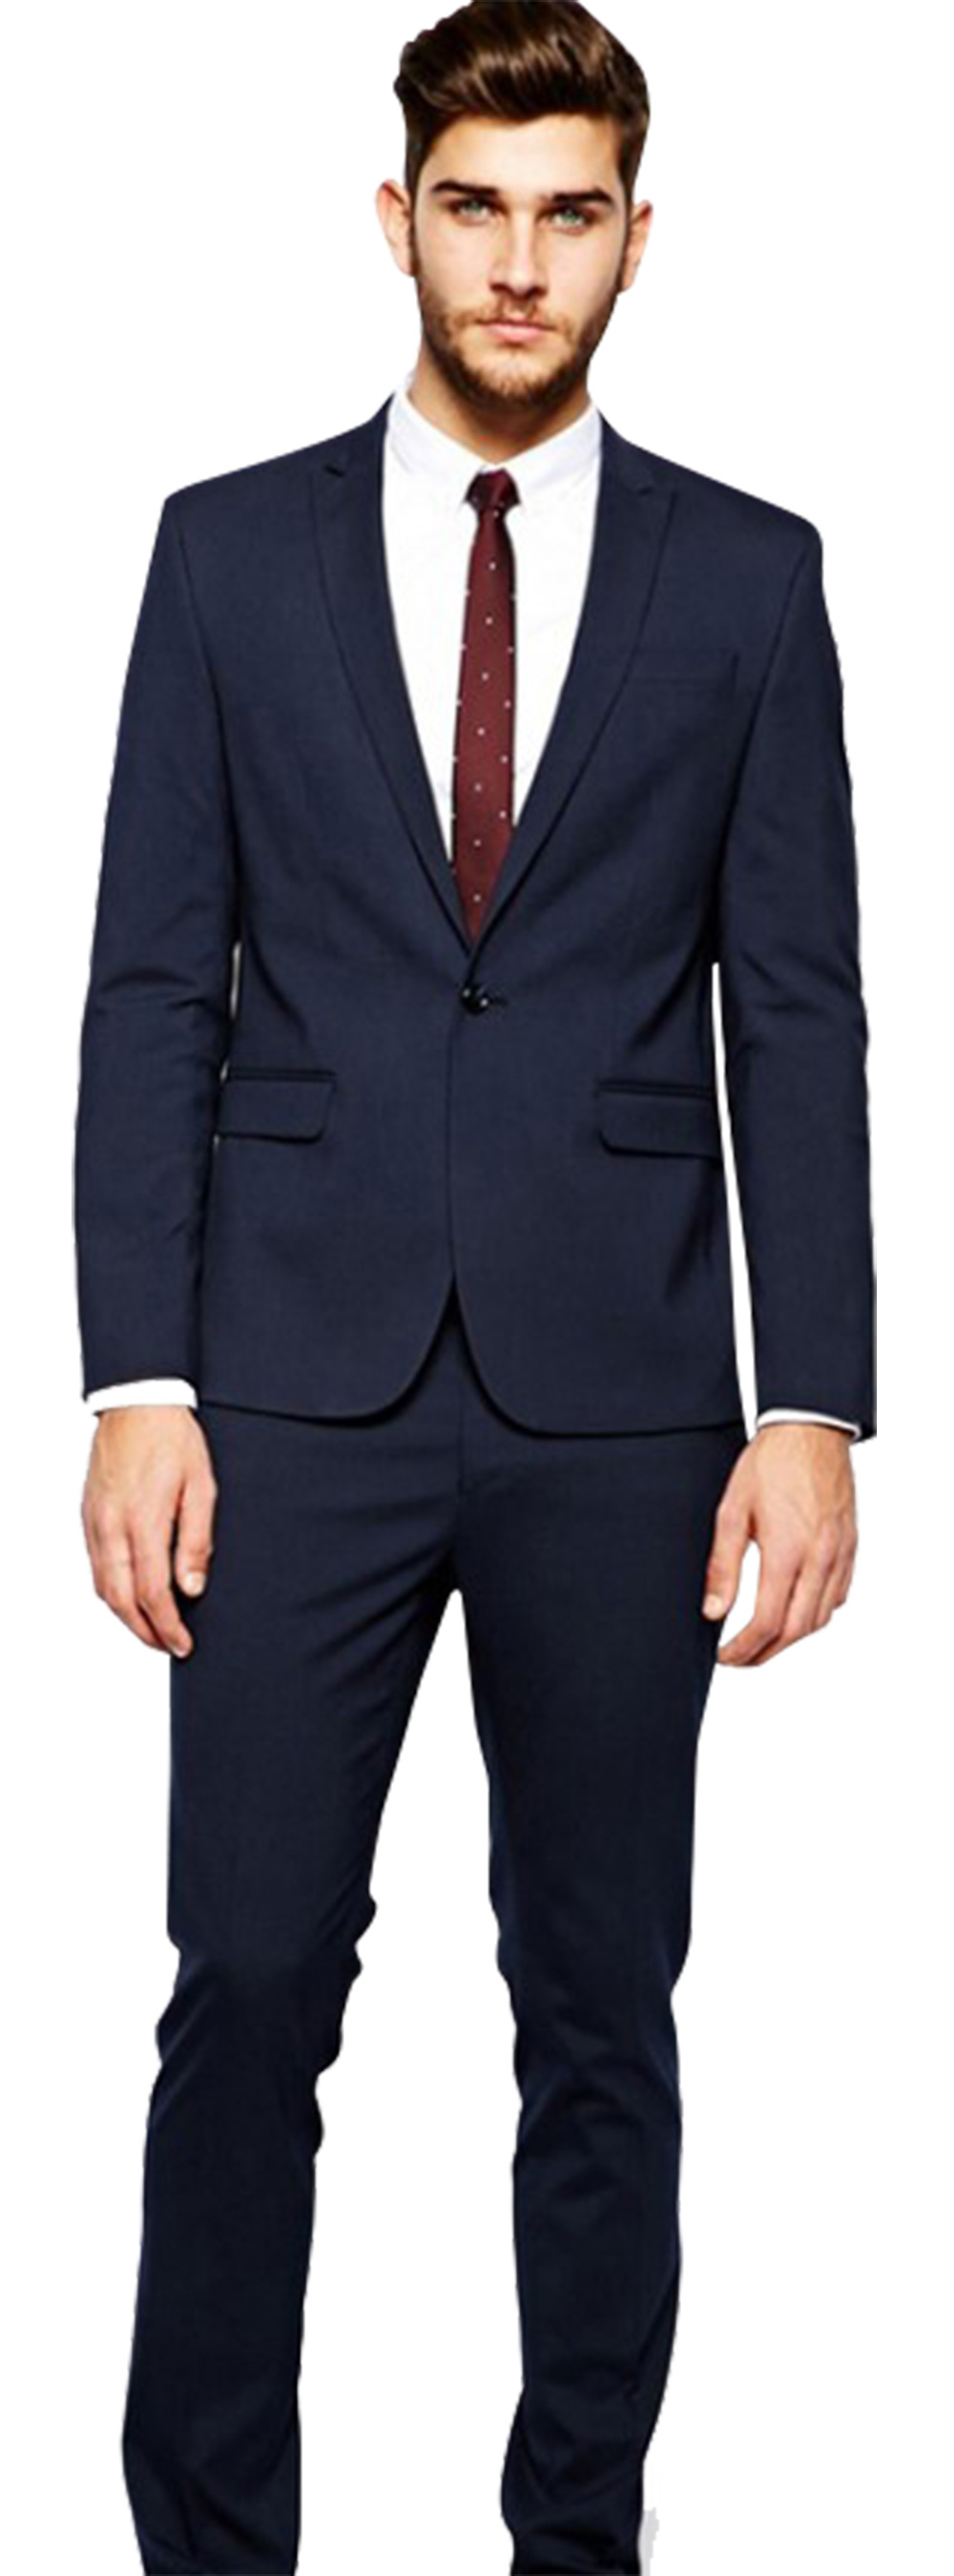 Matthew McConaughey Navy Blue Suit